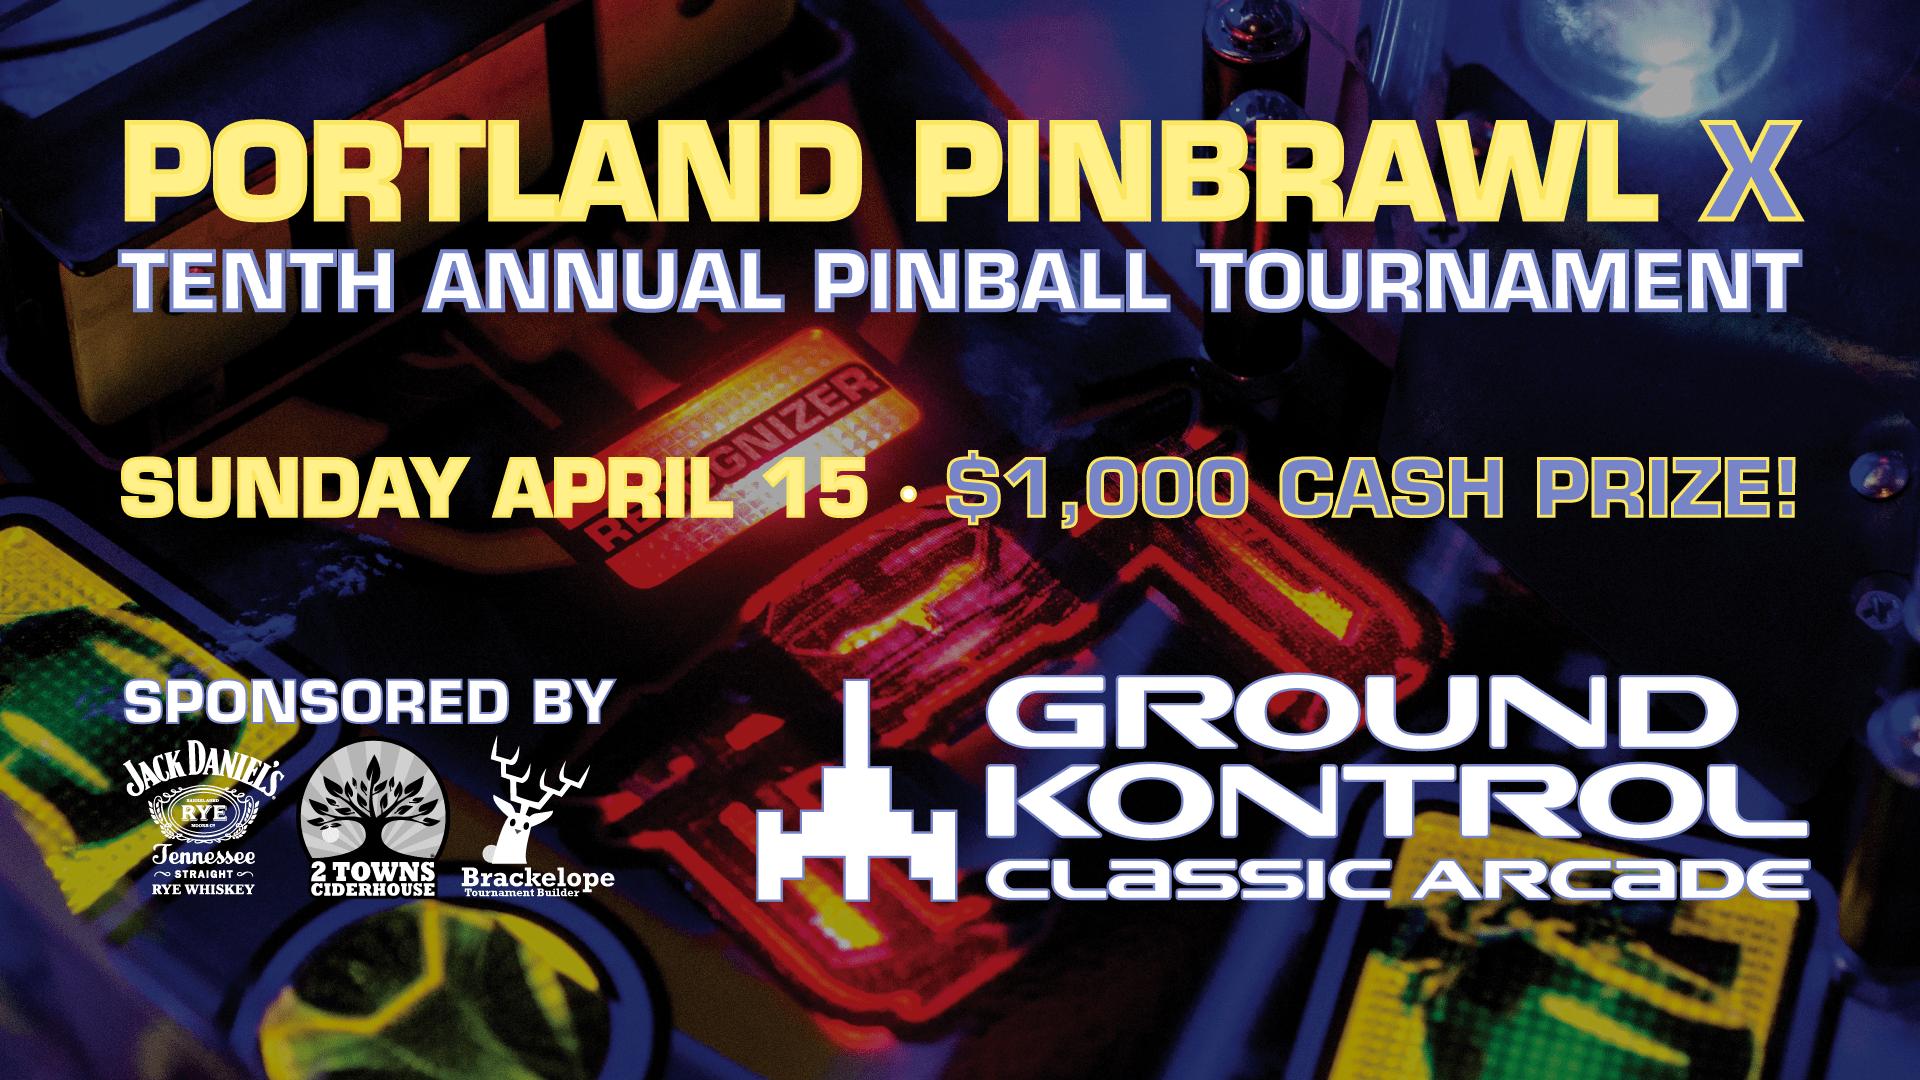 Portland Pinbrawl X – Our 10th Annual Pinball Tournament – Sunday 4/15